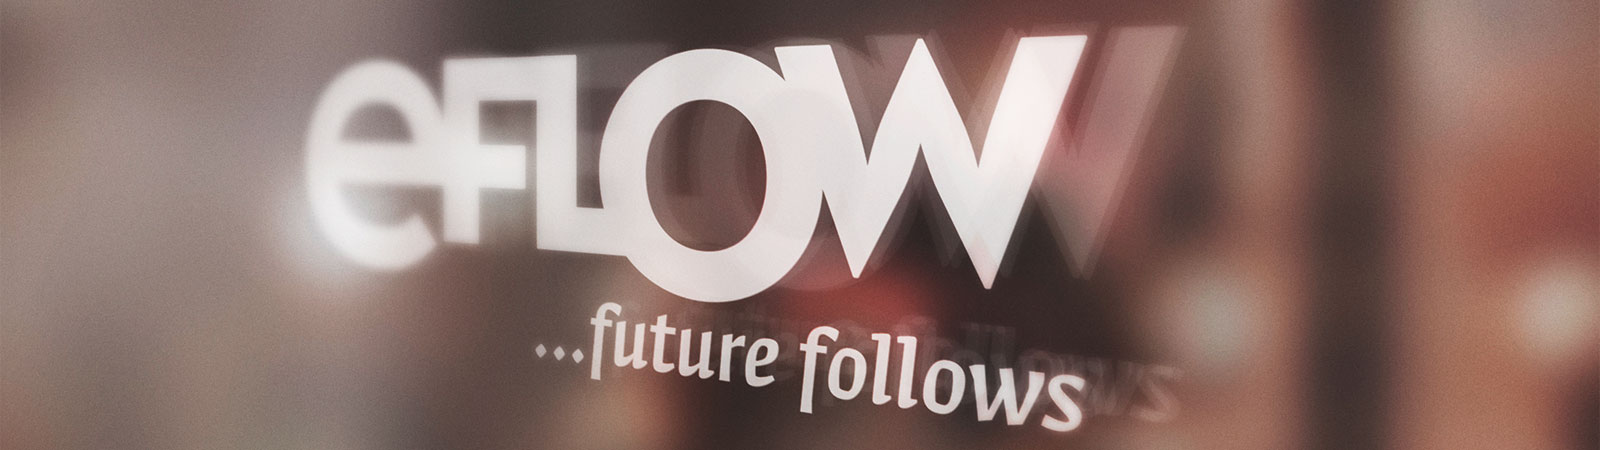 eflow-1600x450-1